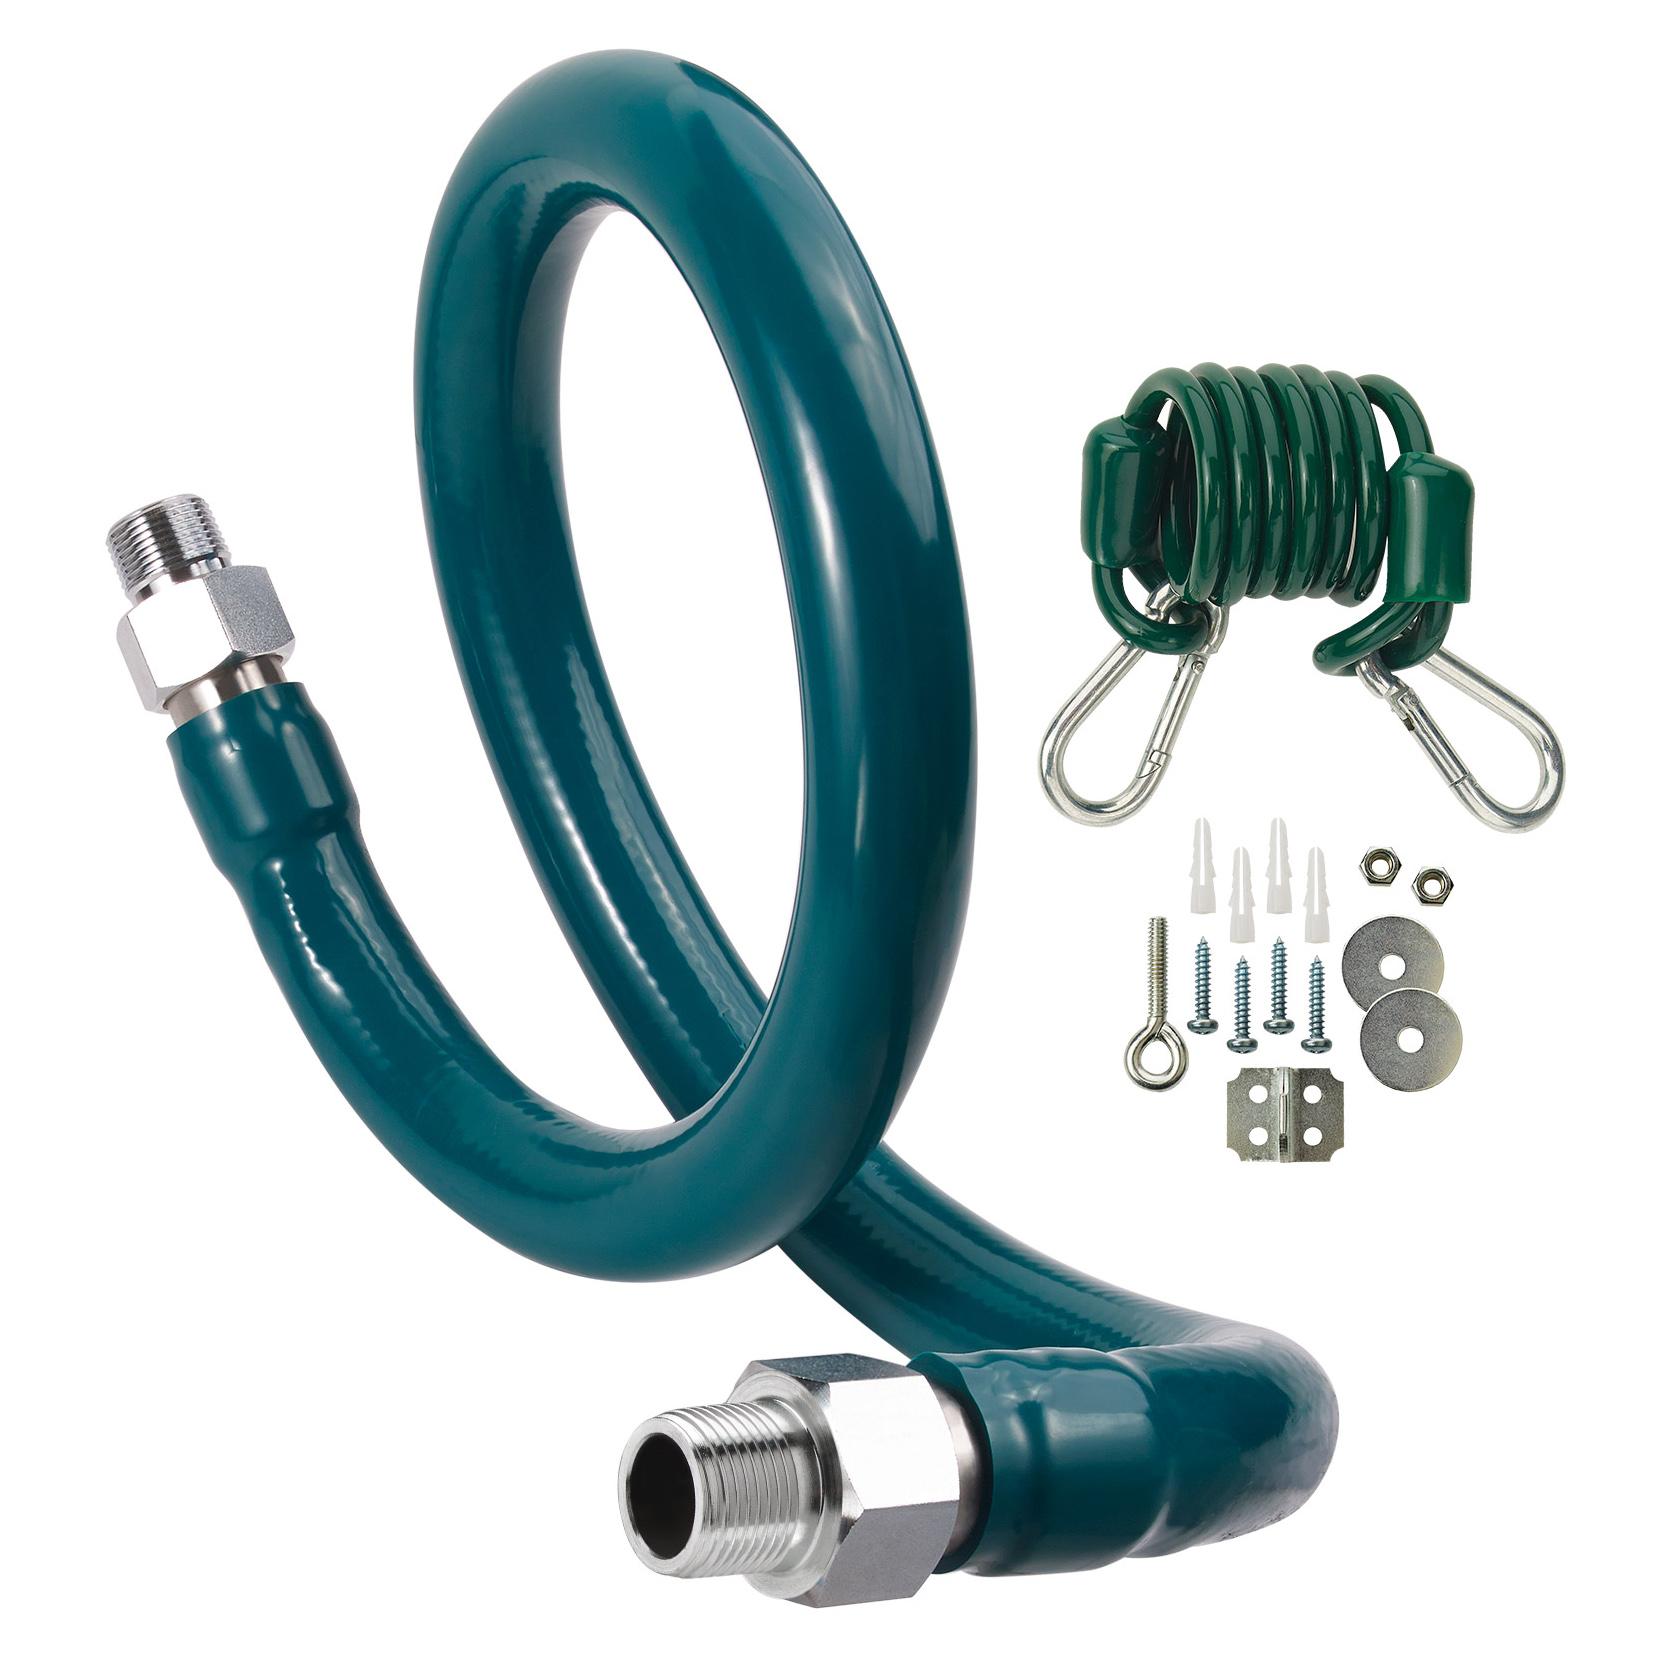 Krowne Metal M7536K6 gas connector hose kit